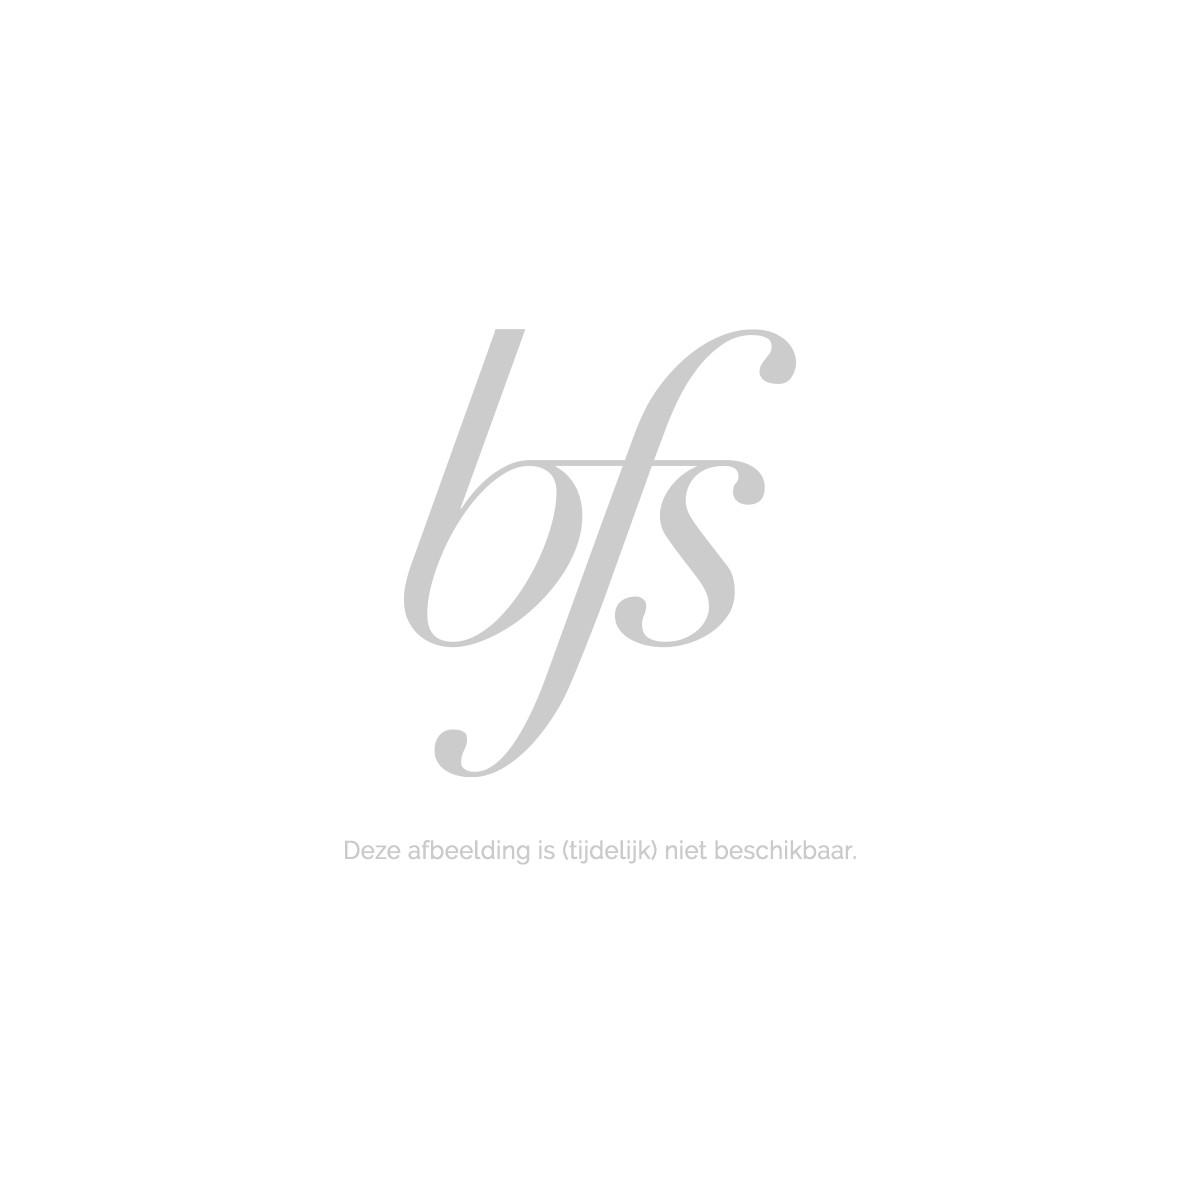 Anastasia Brushes Angled Cut (Small)